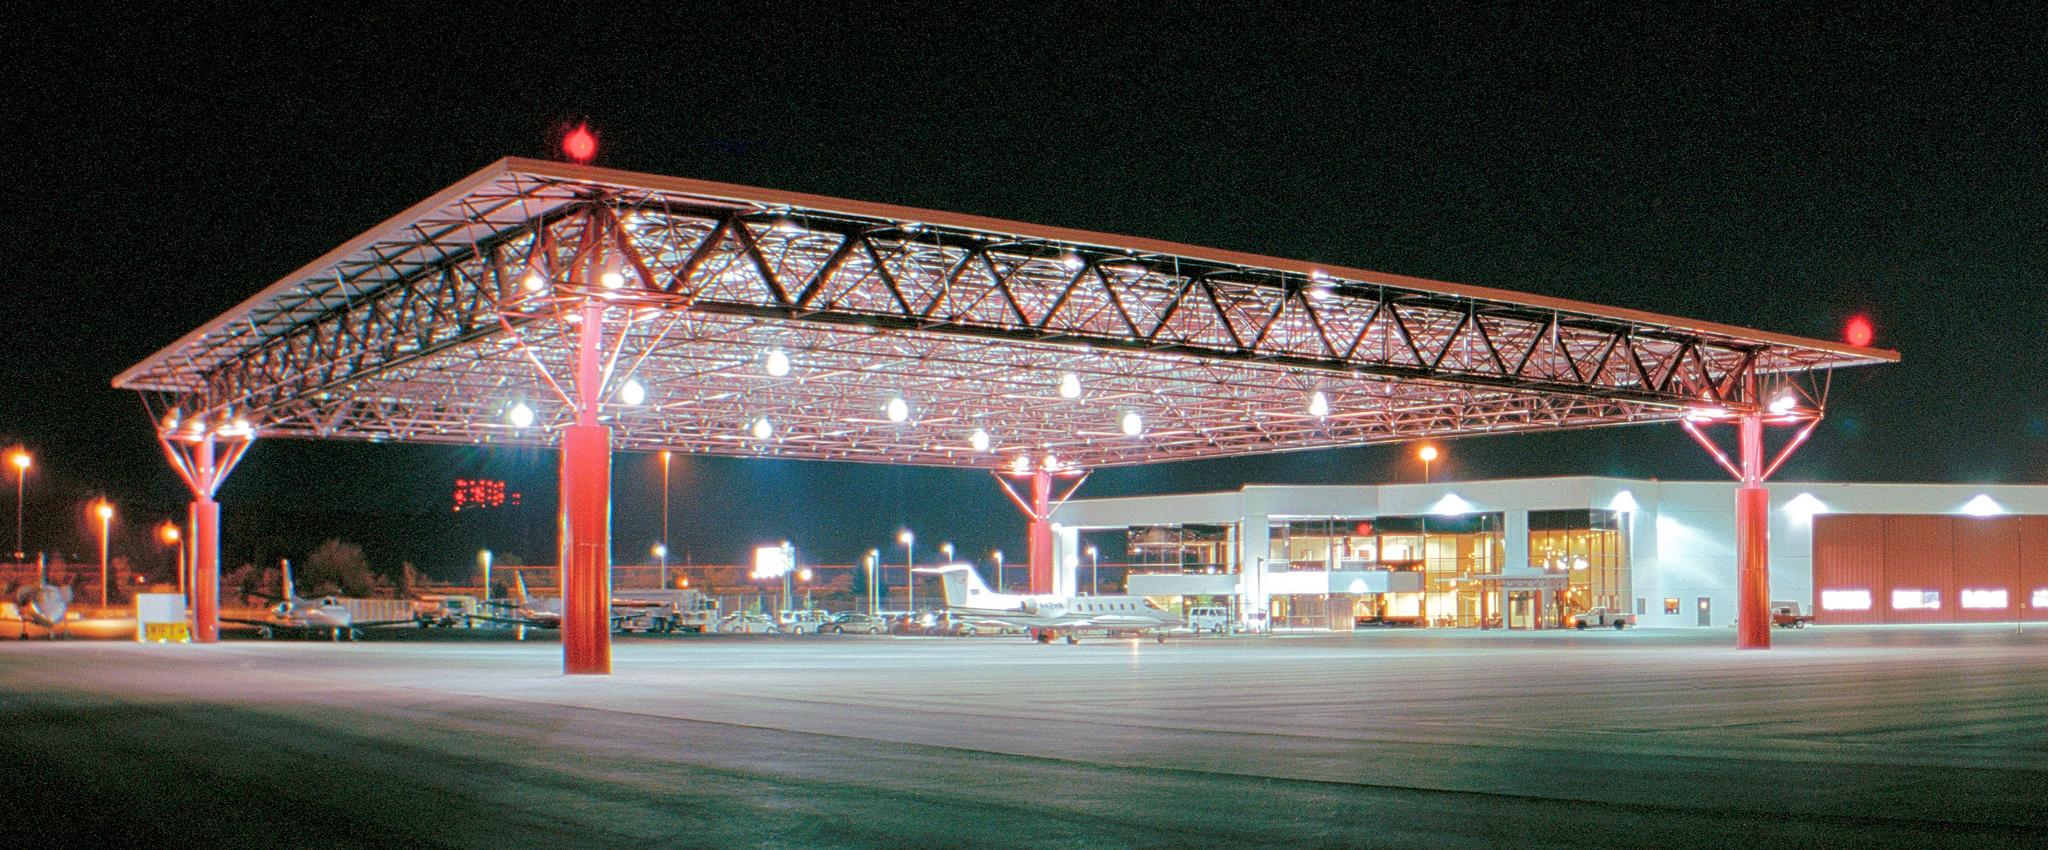 175' x 175' Swift Aviation Hangar at Sky Harbor, Phoenix, AZ, USA.. Design by KG Architects, Phoenix. Photo by Chris Palmer.